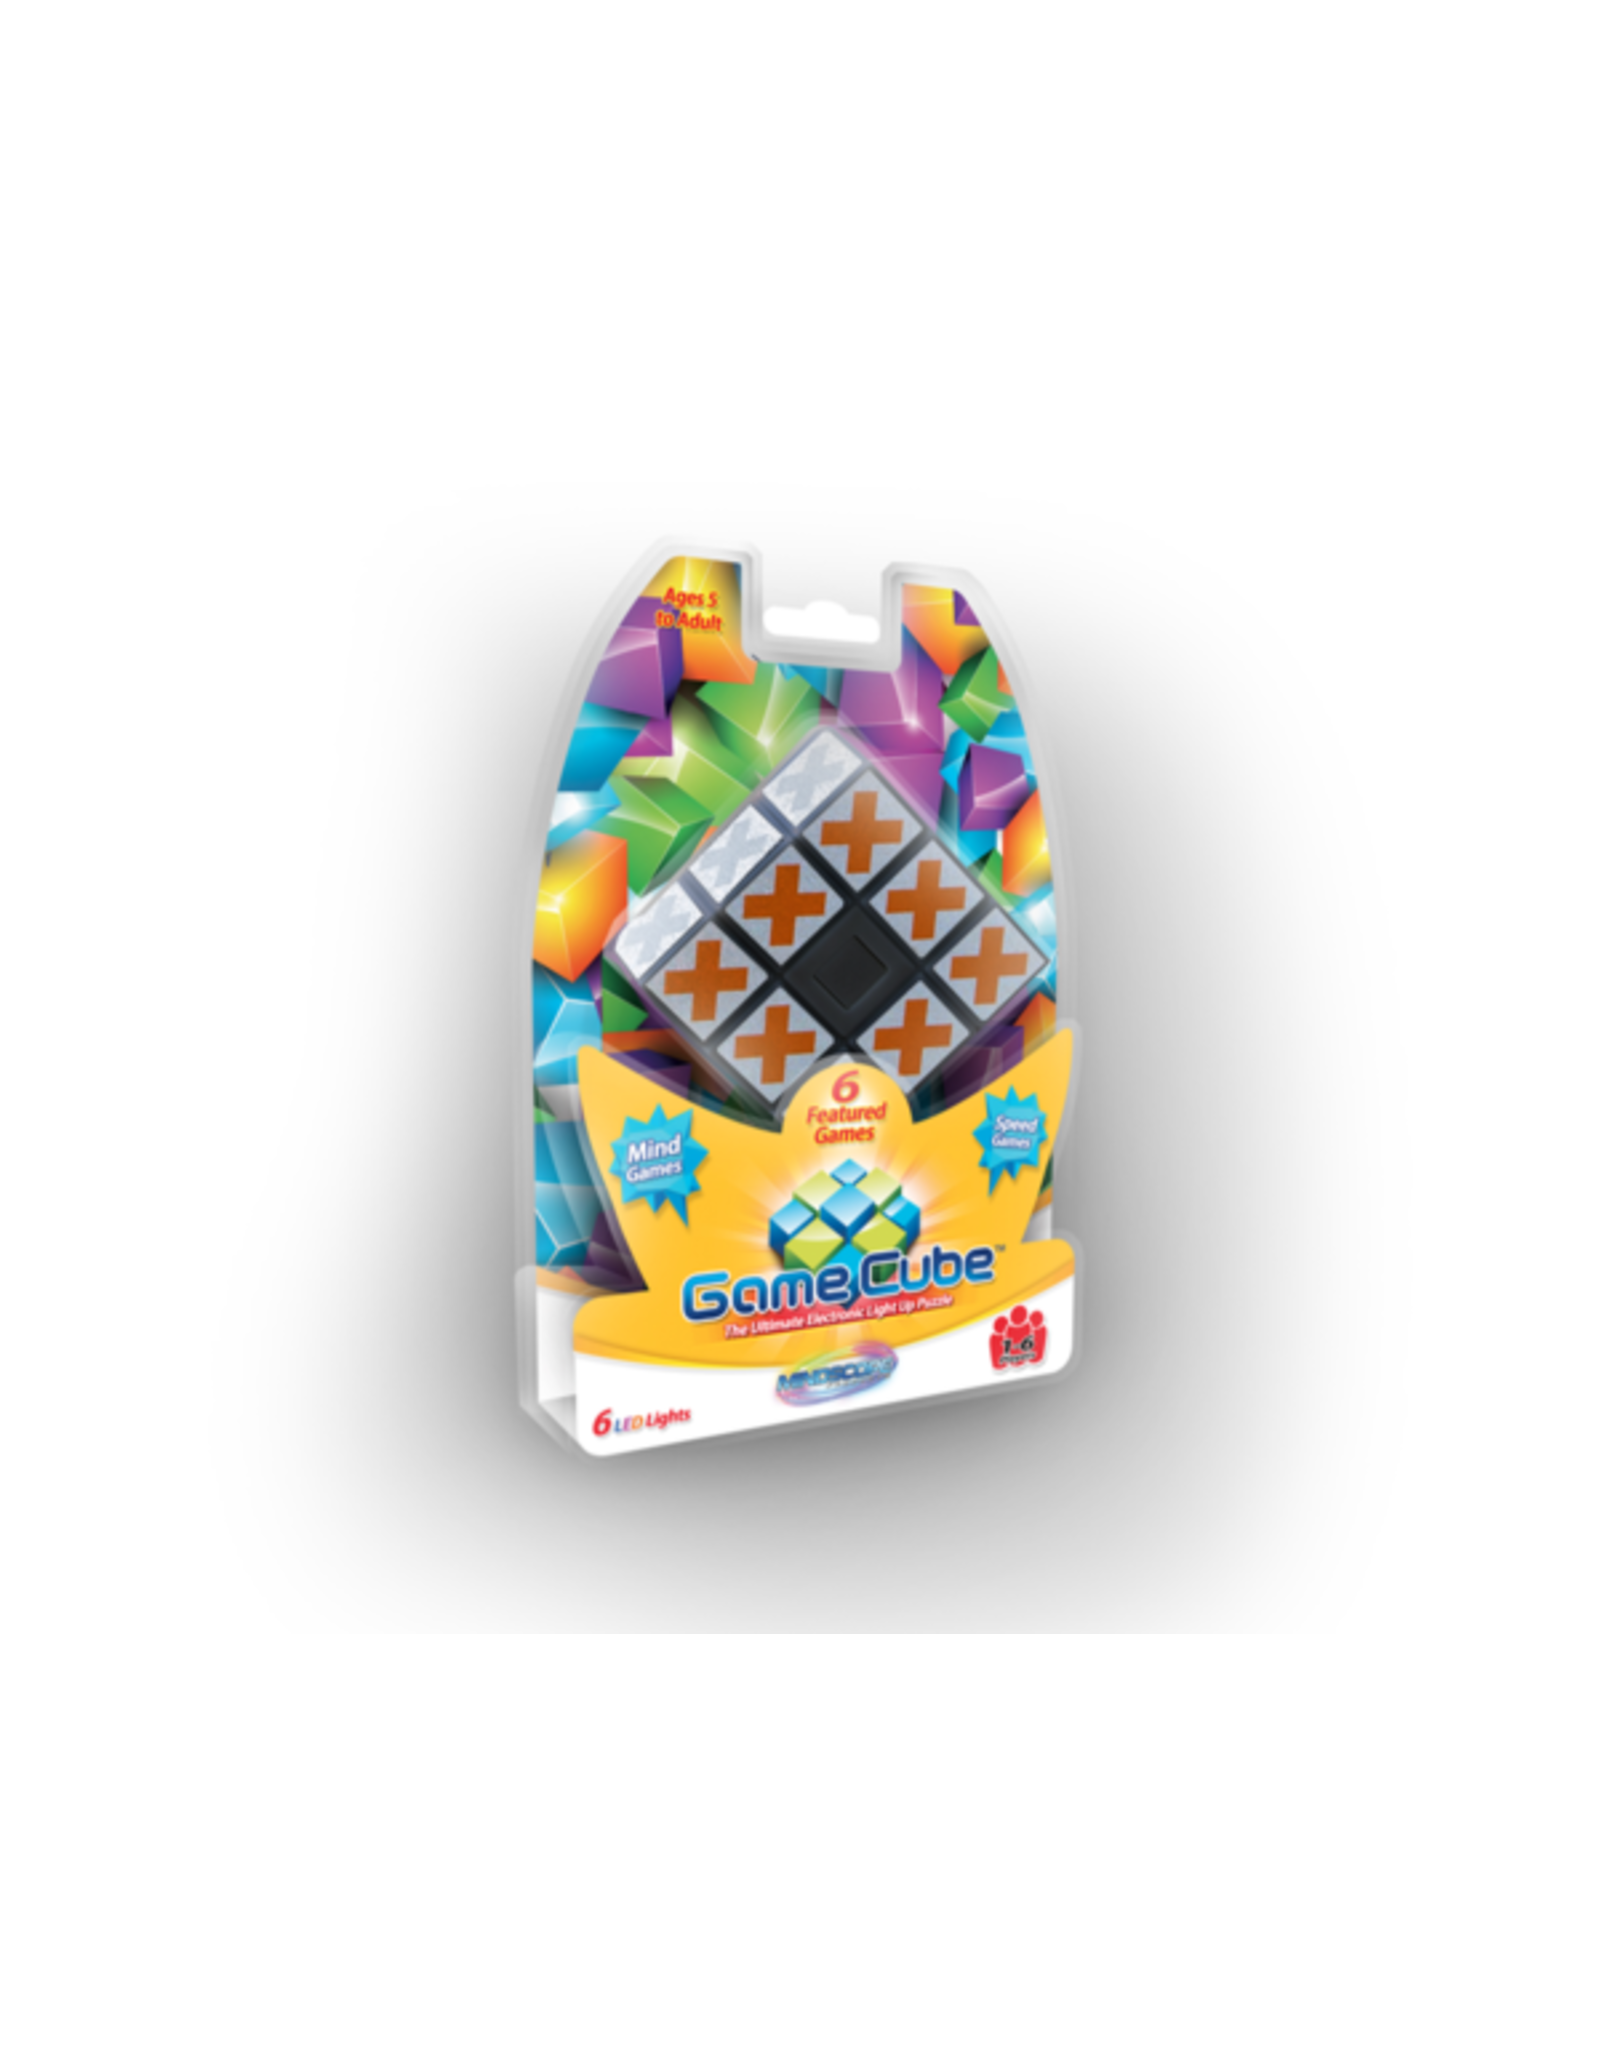 Mindscope Products Gamecube